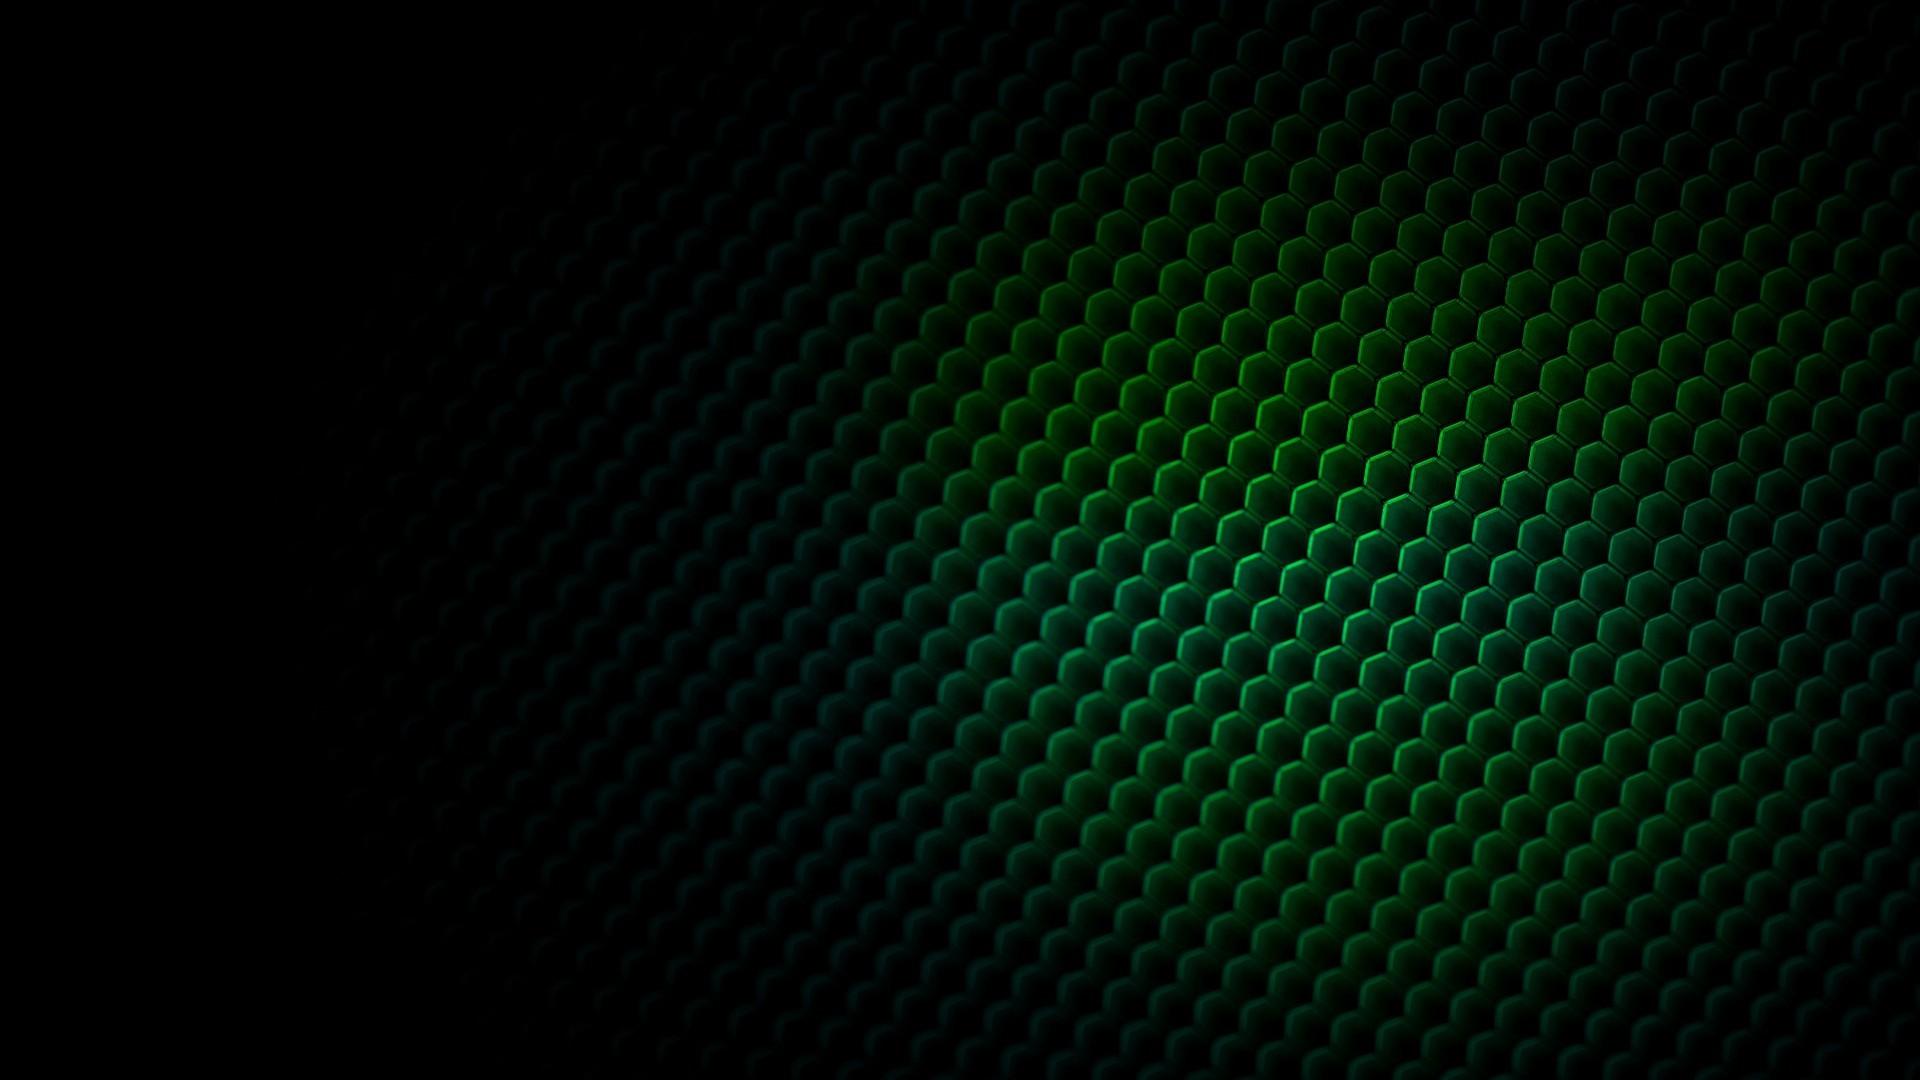 Abstract Green Consciousness Desktop WallPaper HD 1600×1000 Green Hd  Wallpaper (36 Wallpapers)